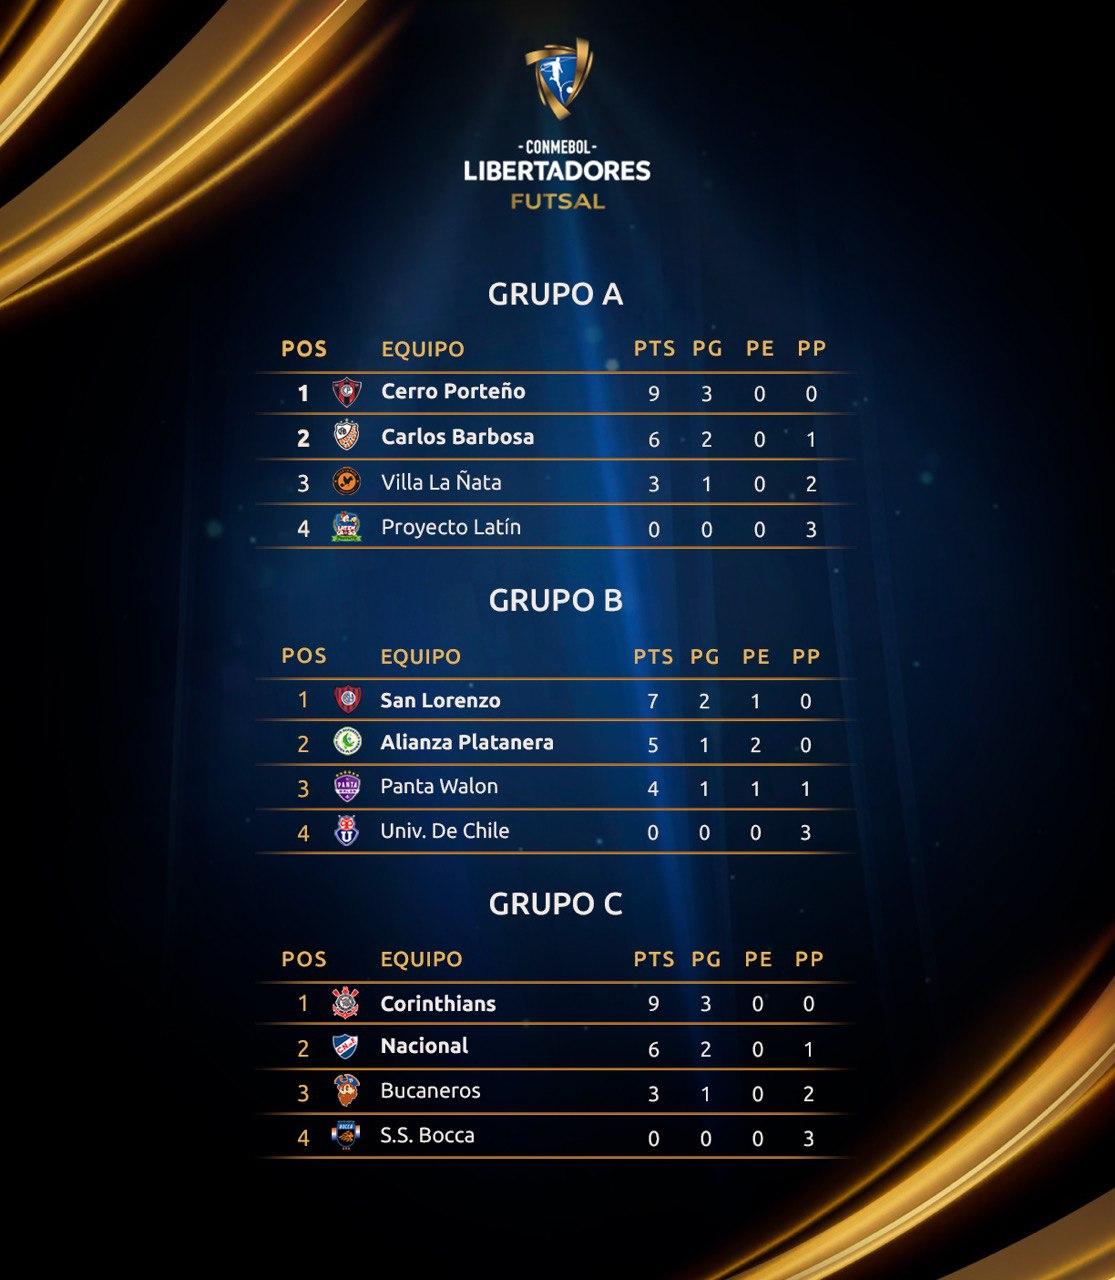 Grupos Libertadores Futsal - final